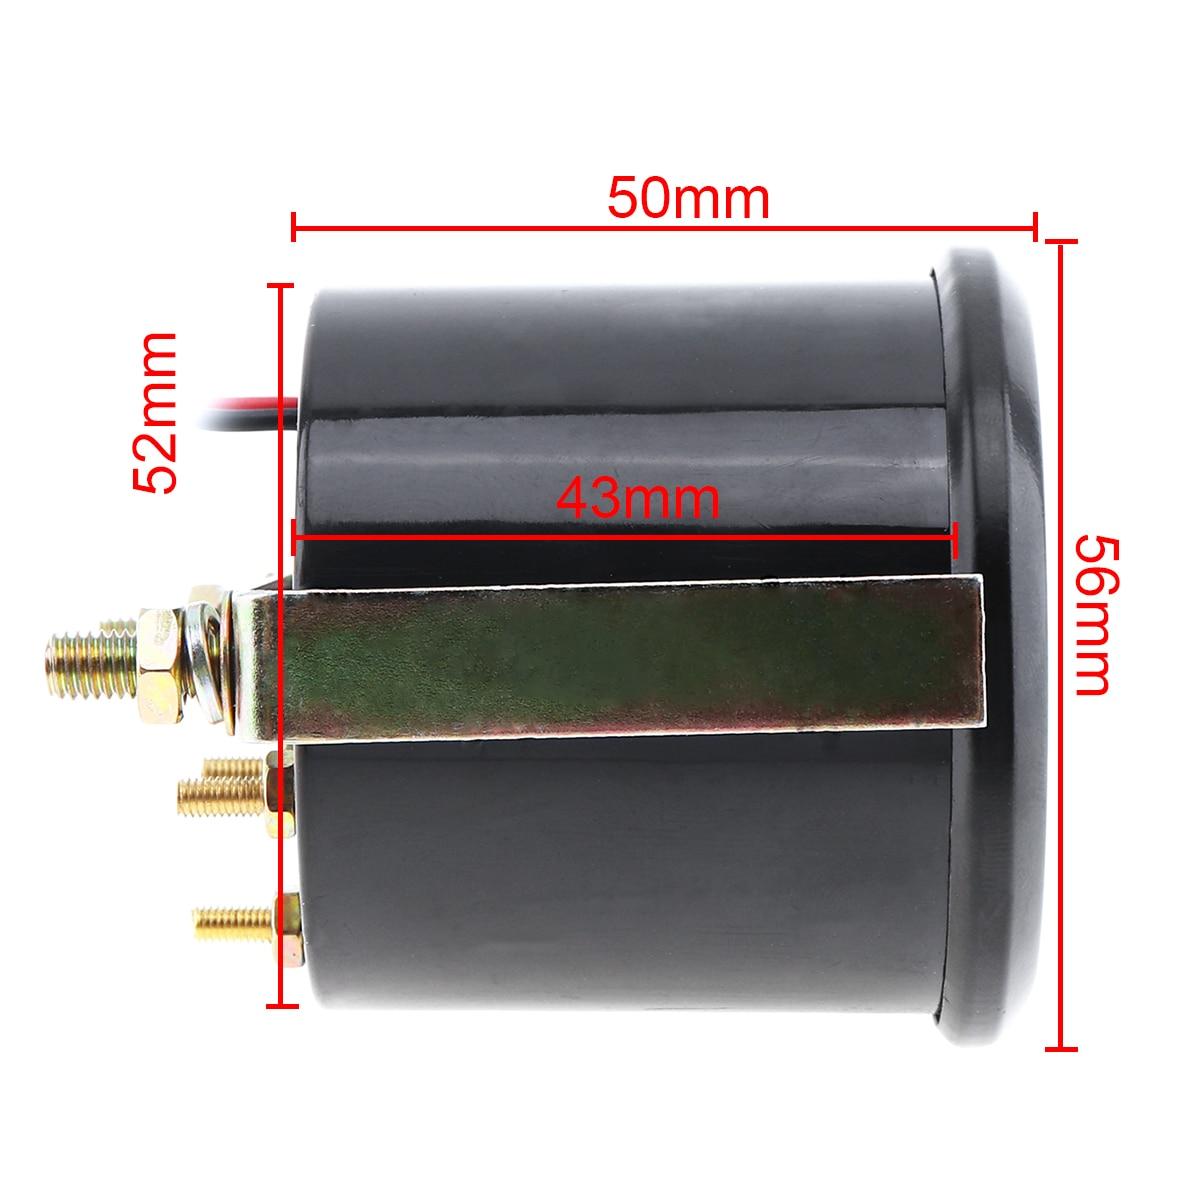 6035BL 2 quot 52mm Blue LED 12V 50 150 Celsius Degree Oil Temperature Meter Gauge with Sensor for Car Boat Truck ATV in Oil Pressure Gauges from Automobiles amp Motorcycles